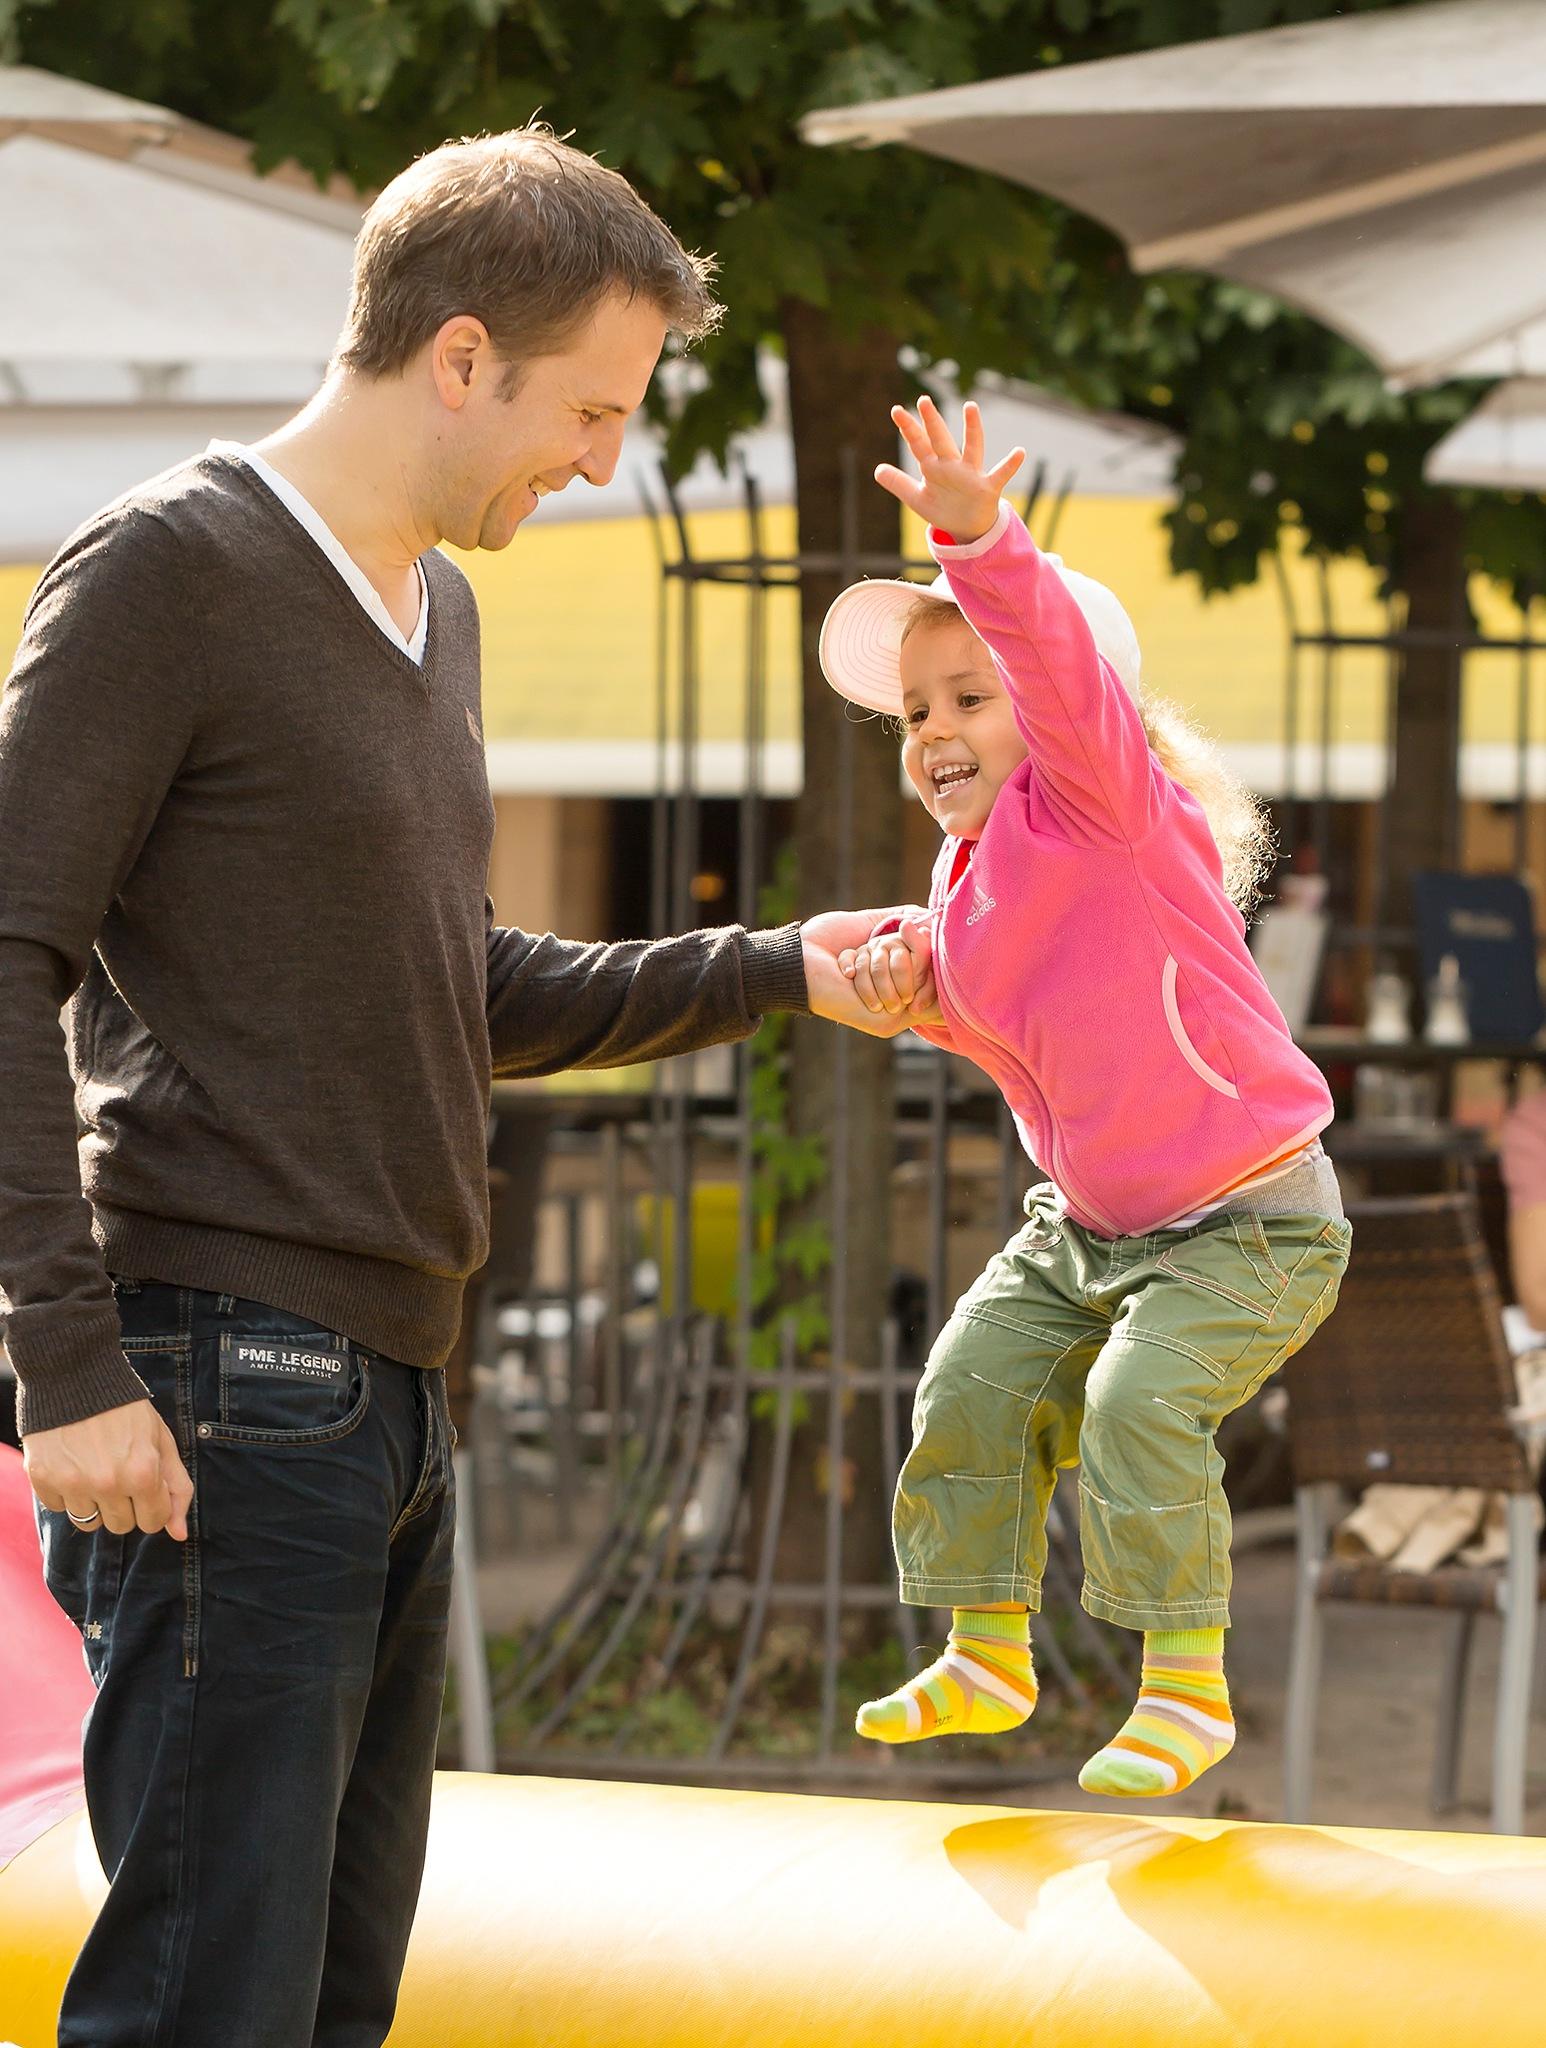 Joy - International Children's Day by JaneCampbell21